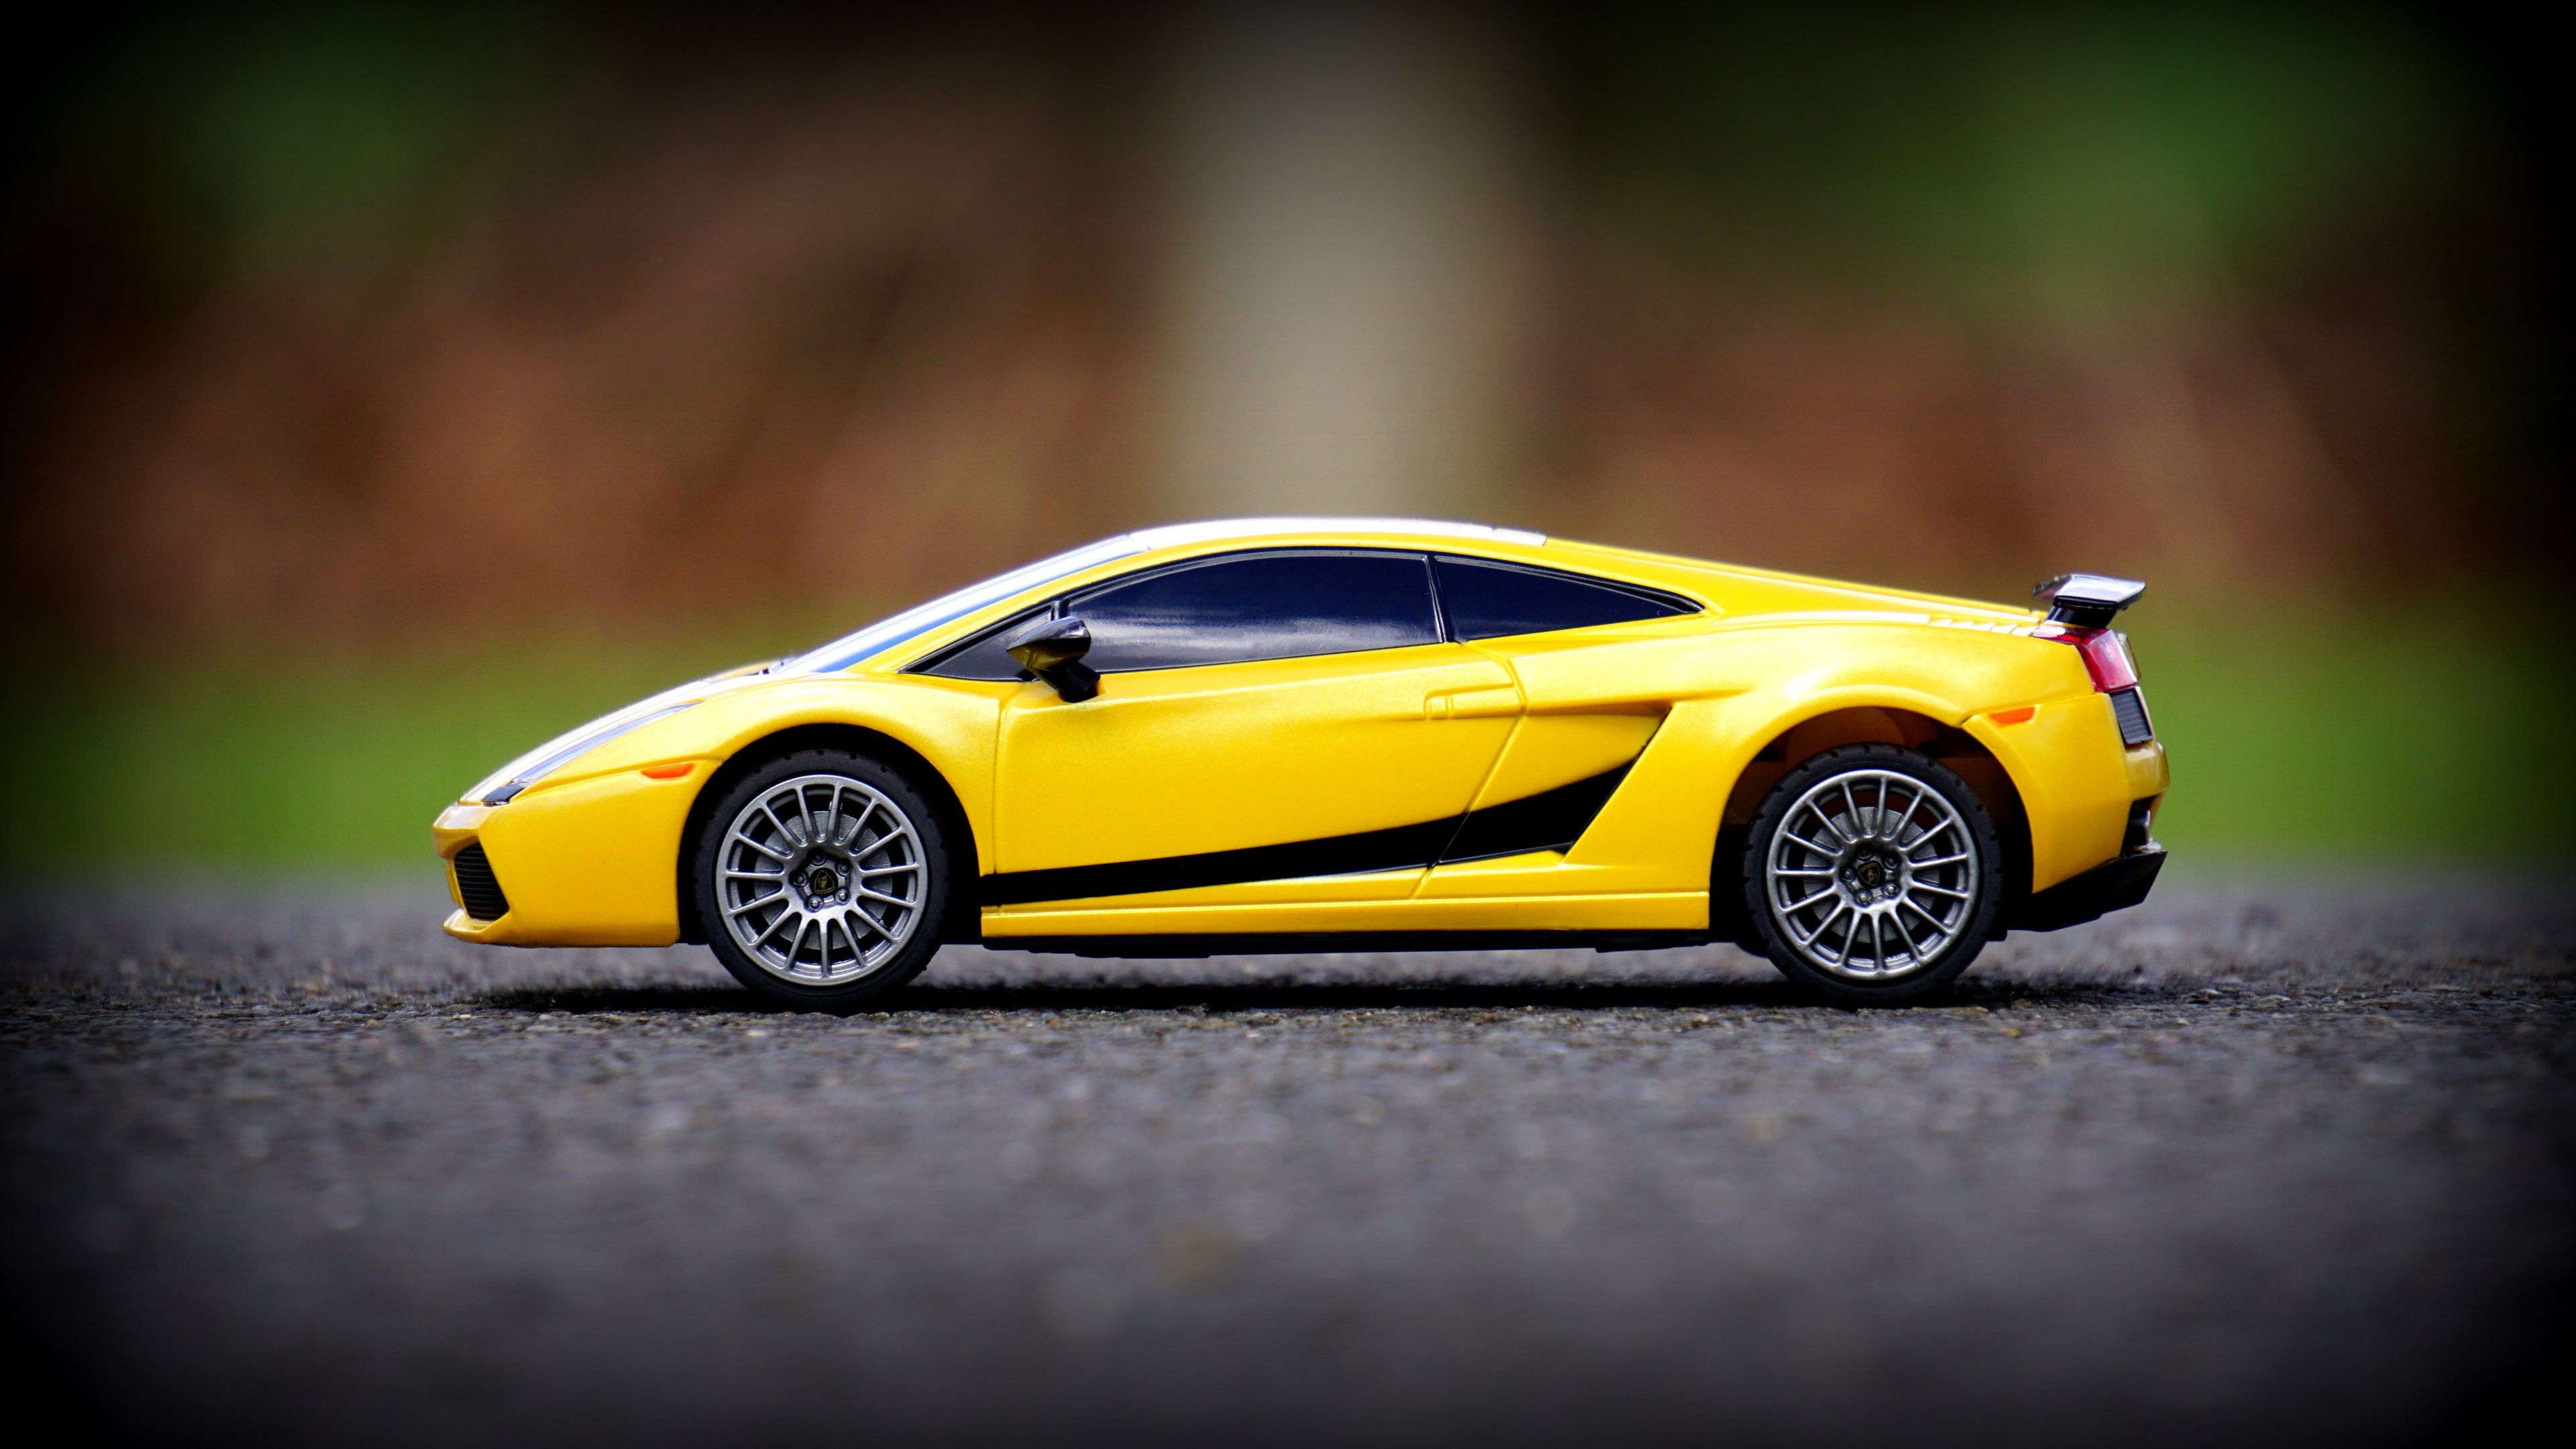 Lamborghini Toy Car K Wallpaper K Car Lamborghini Toy Wallpaper